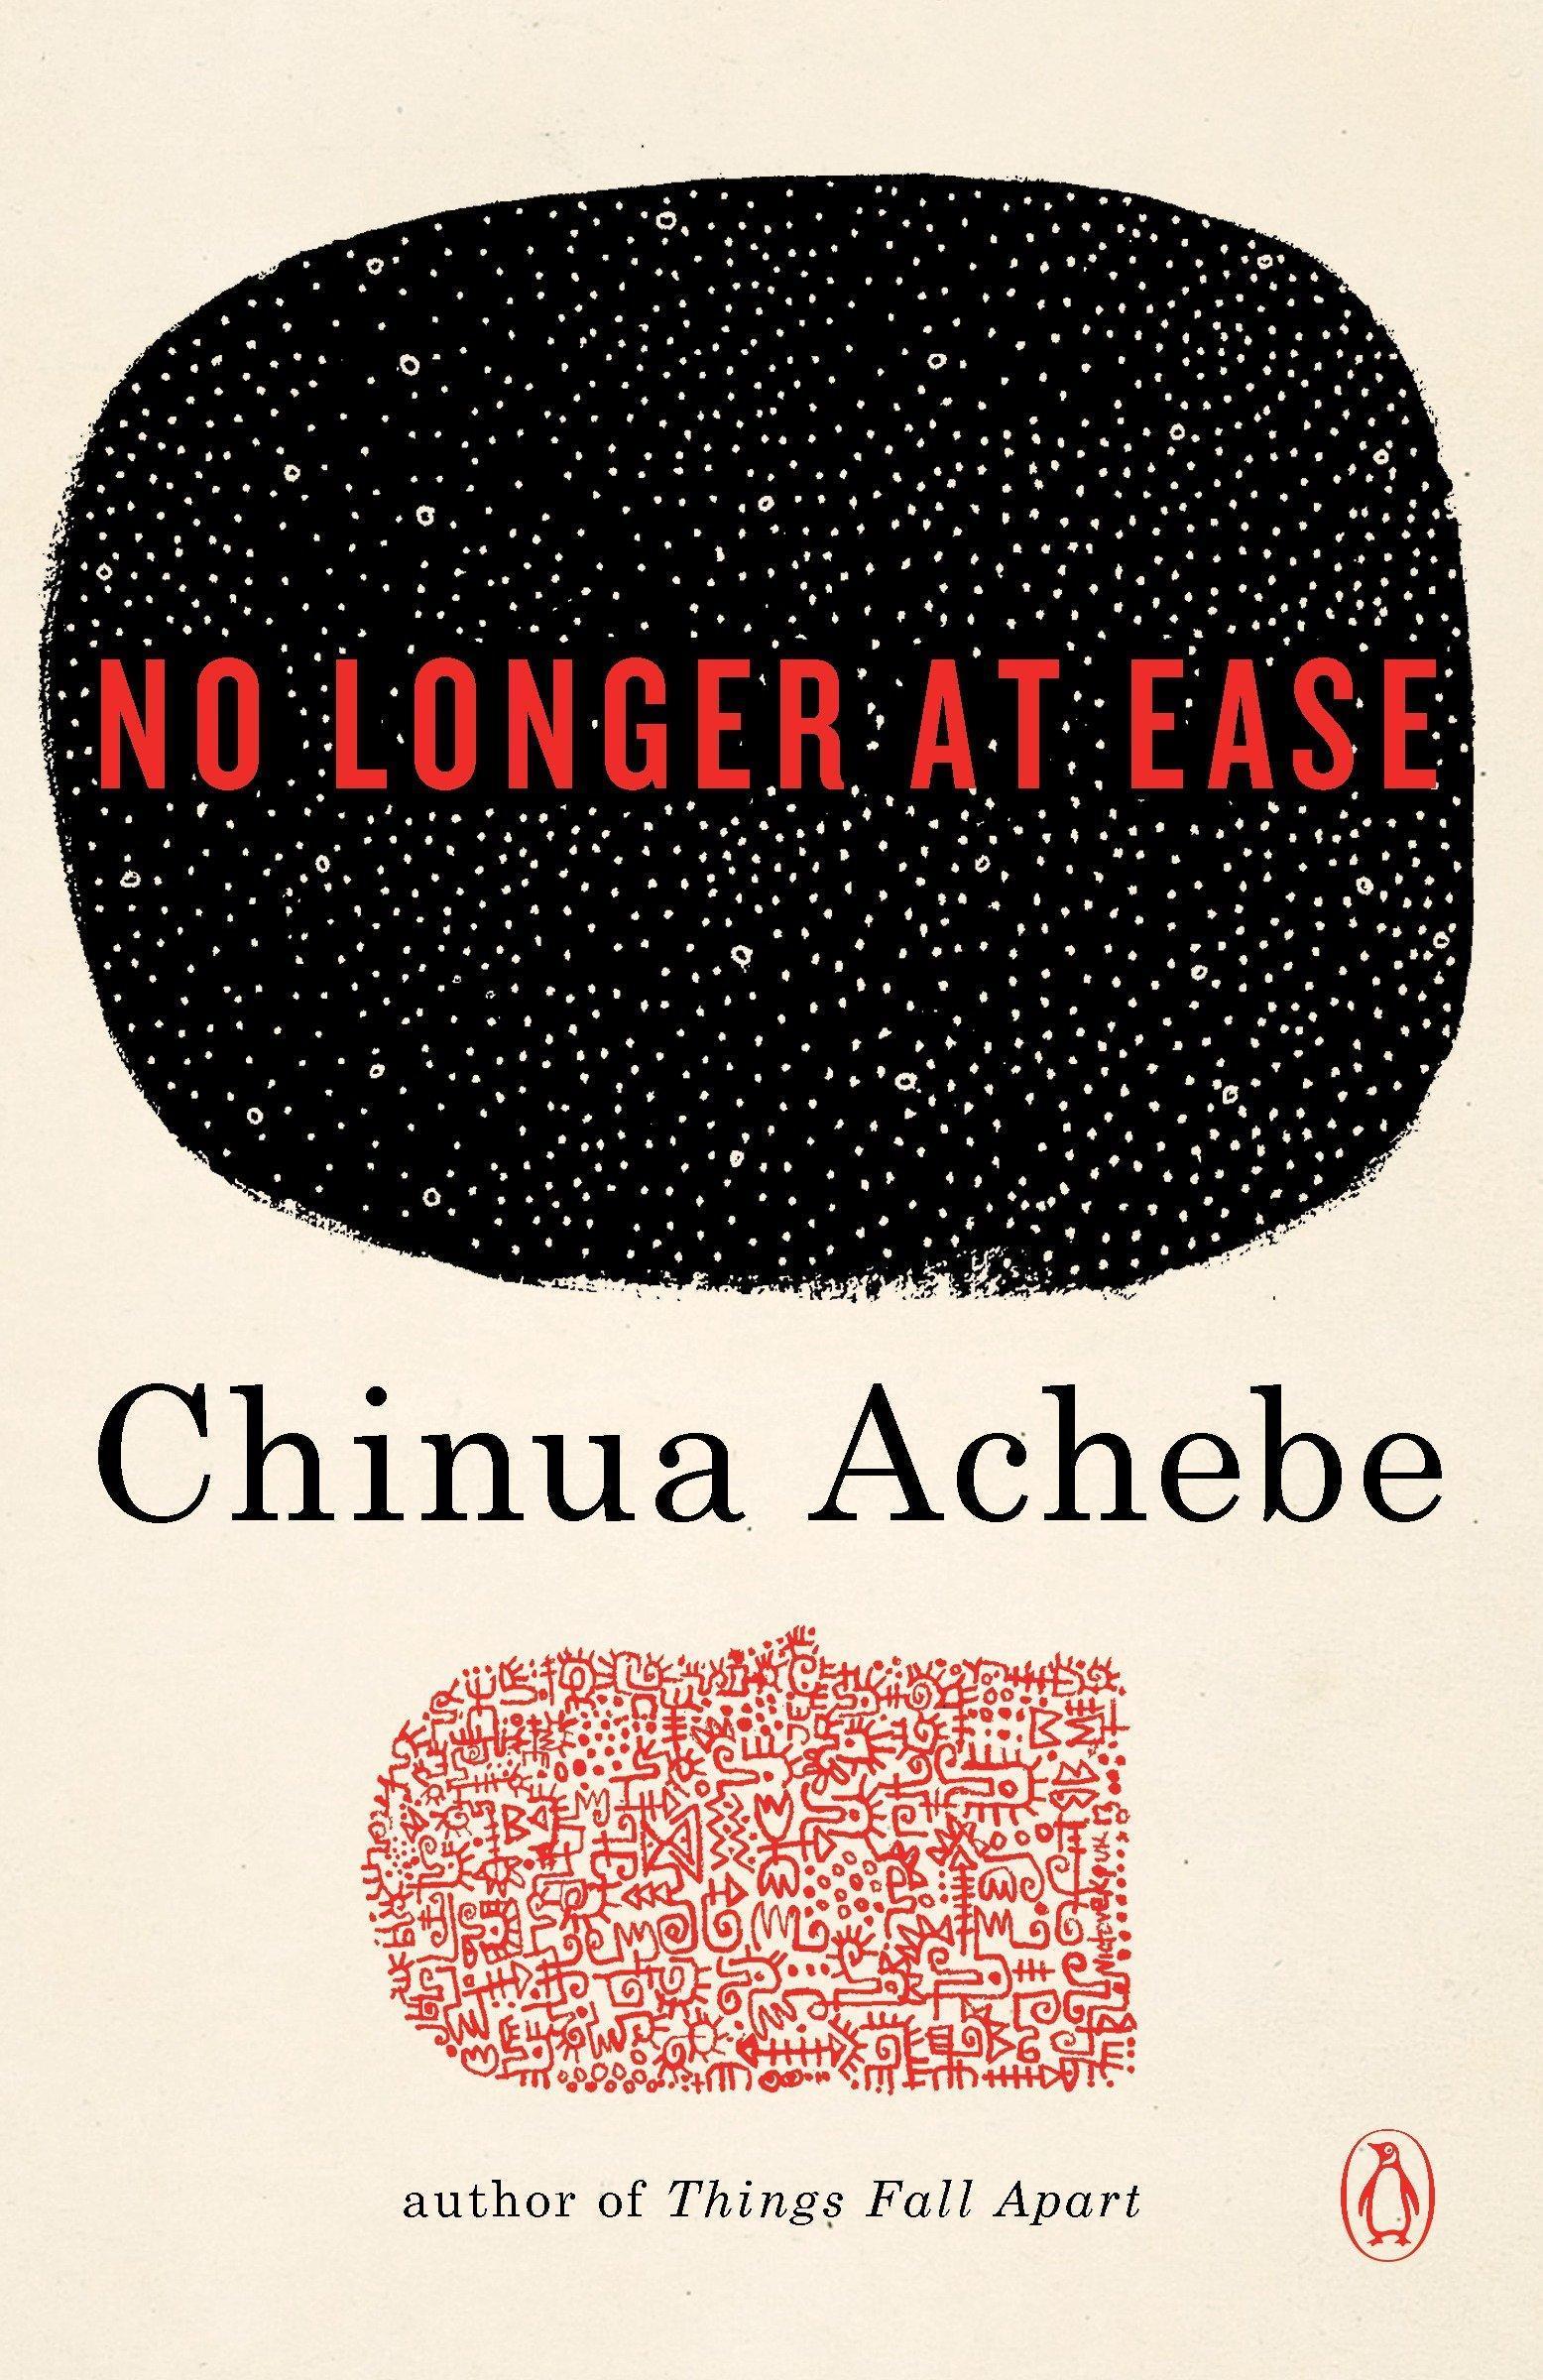 No Longer to Ease, Chinua Achebe